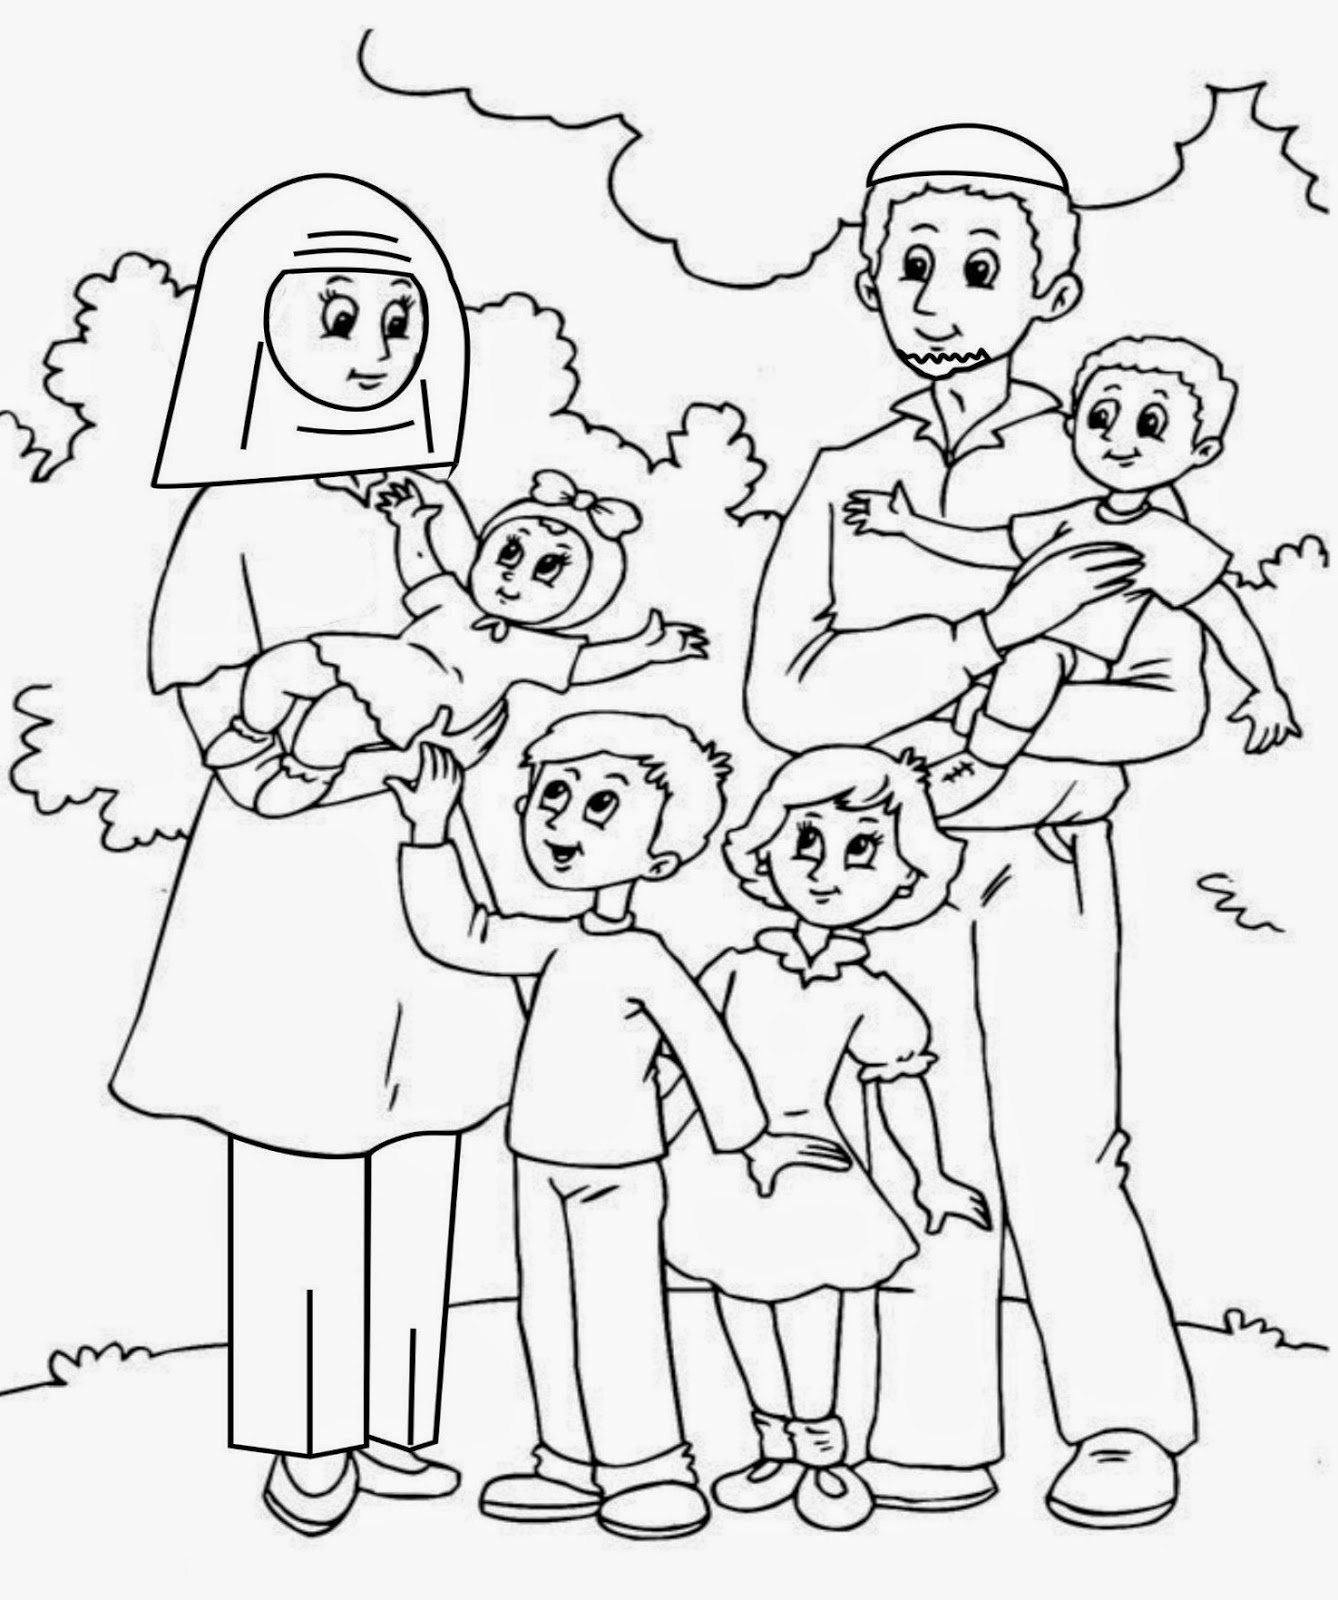 Gambar Mewarnai Keluarga